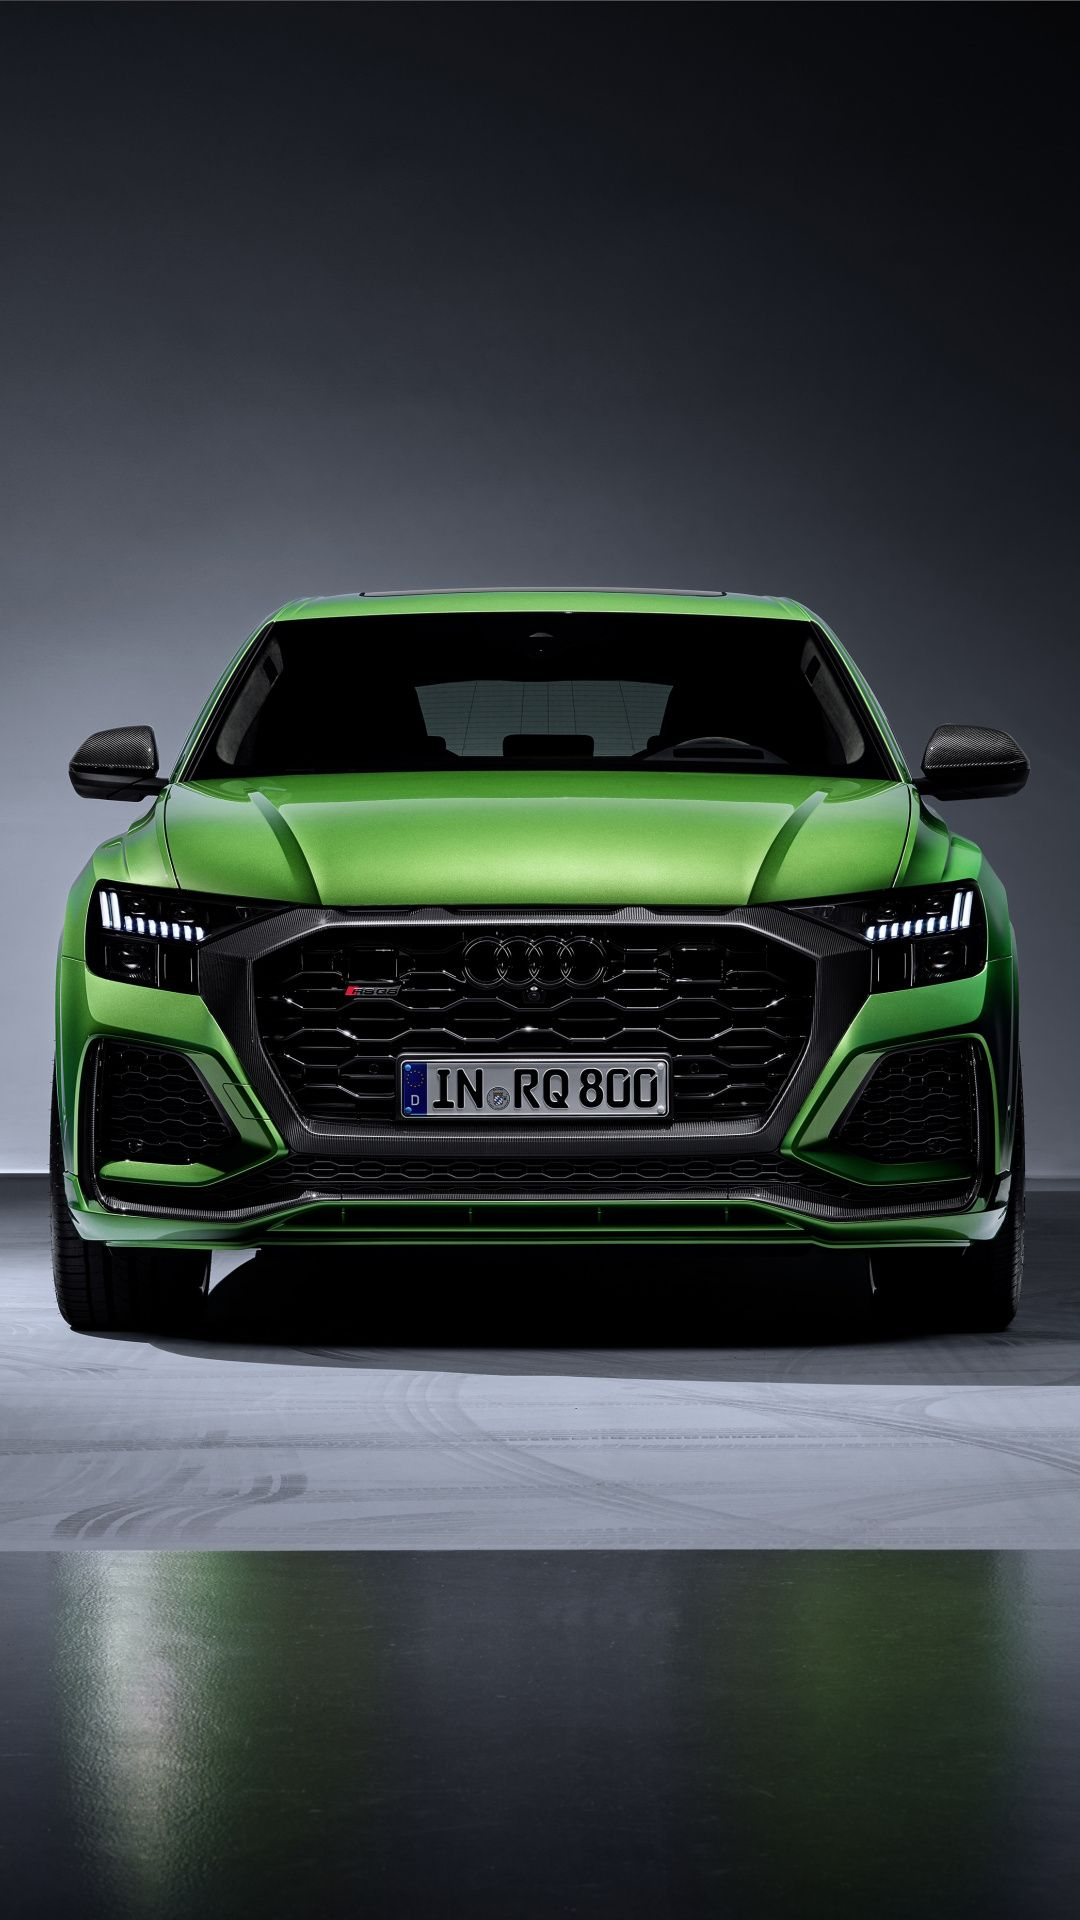 1080x1920 Front View Green Audi Q8 Wallpaper Audi Car